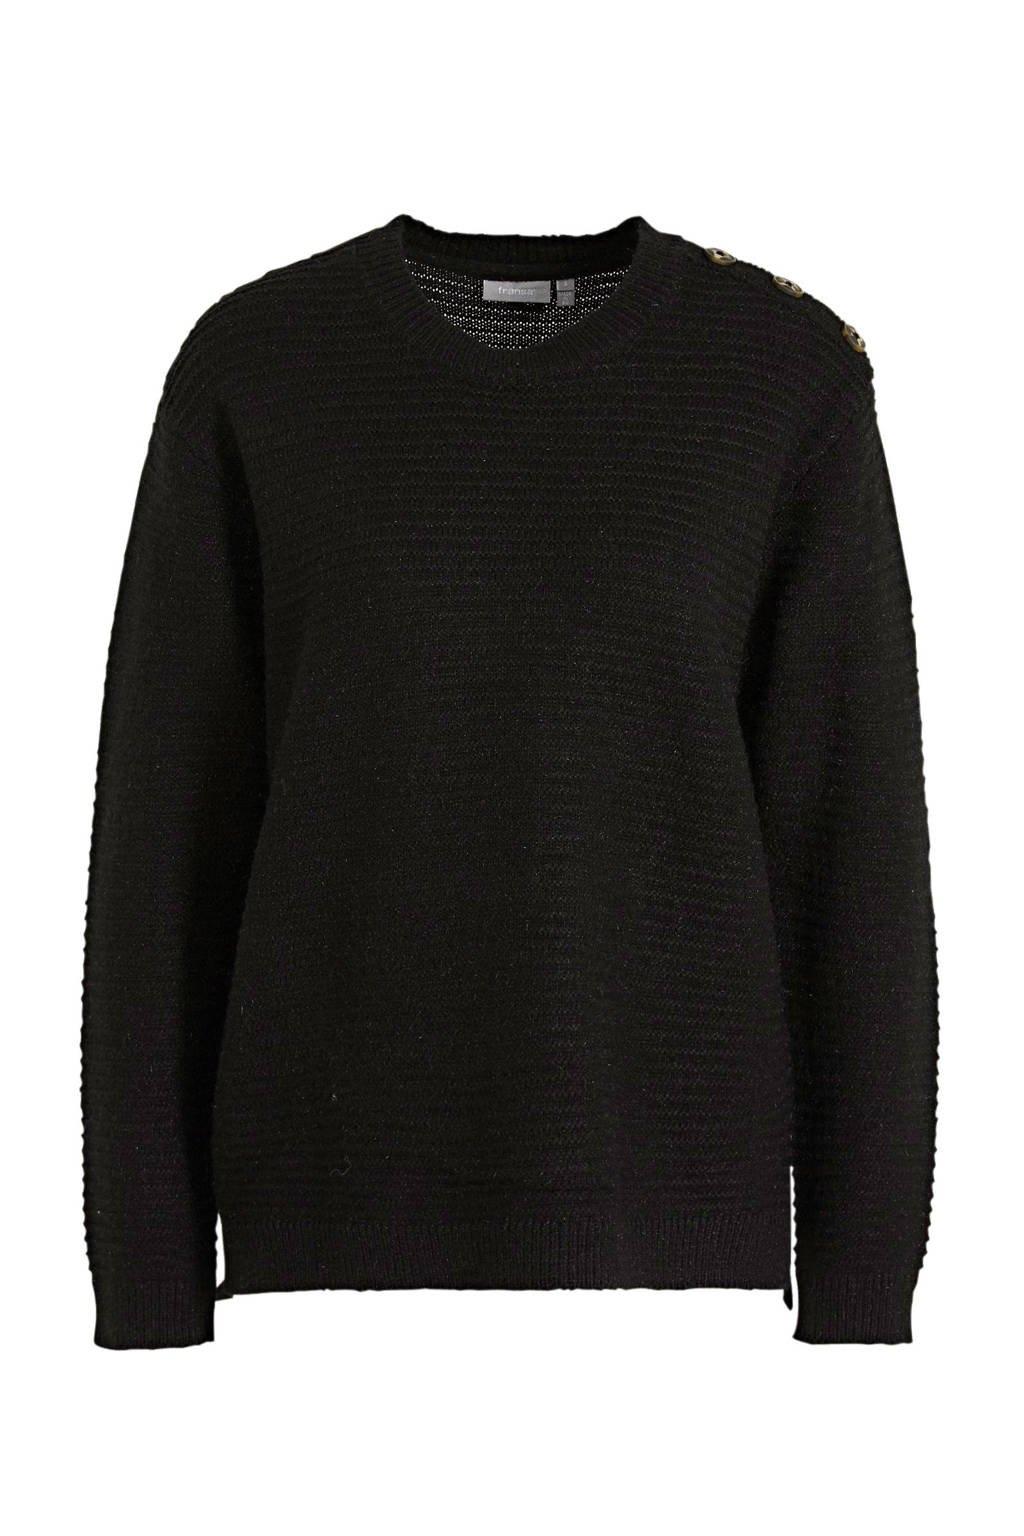 Fransa ribgebreide trui Eretta met glitters zwart, Zwart